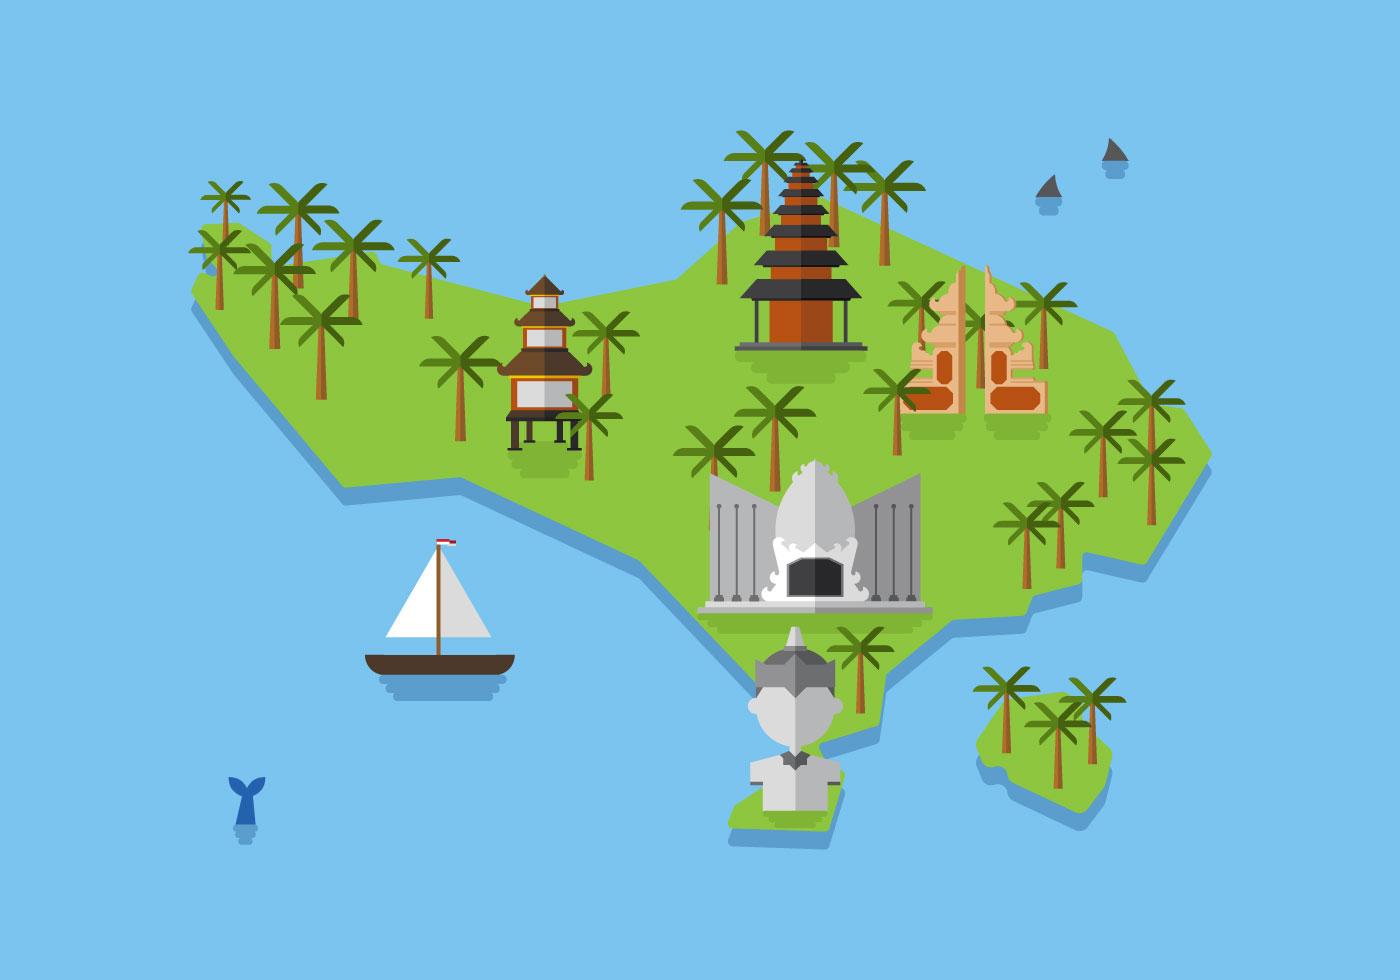 Vector Bali Map - Download Free Vector Art, Stock Graphics & Images